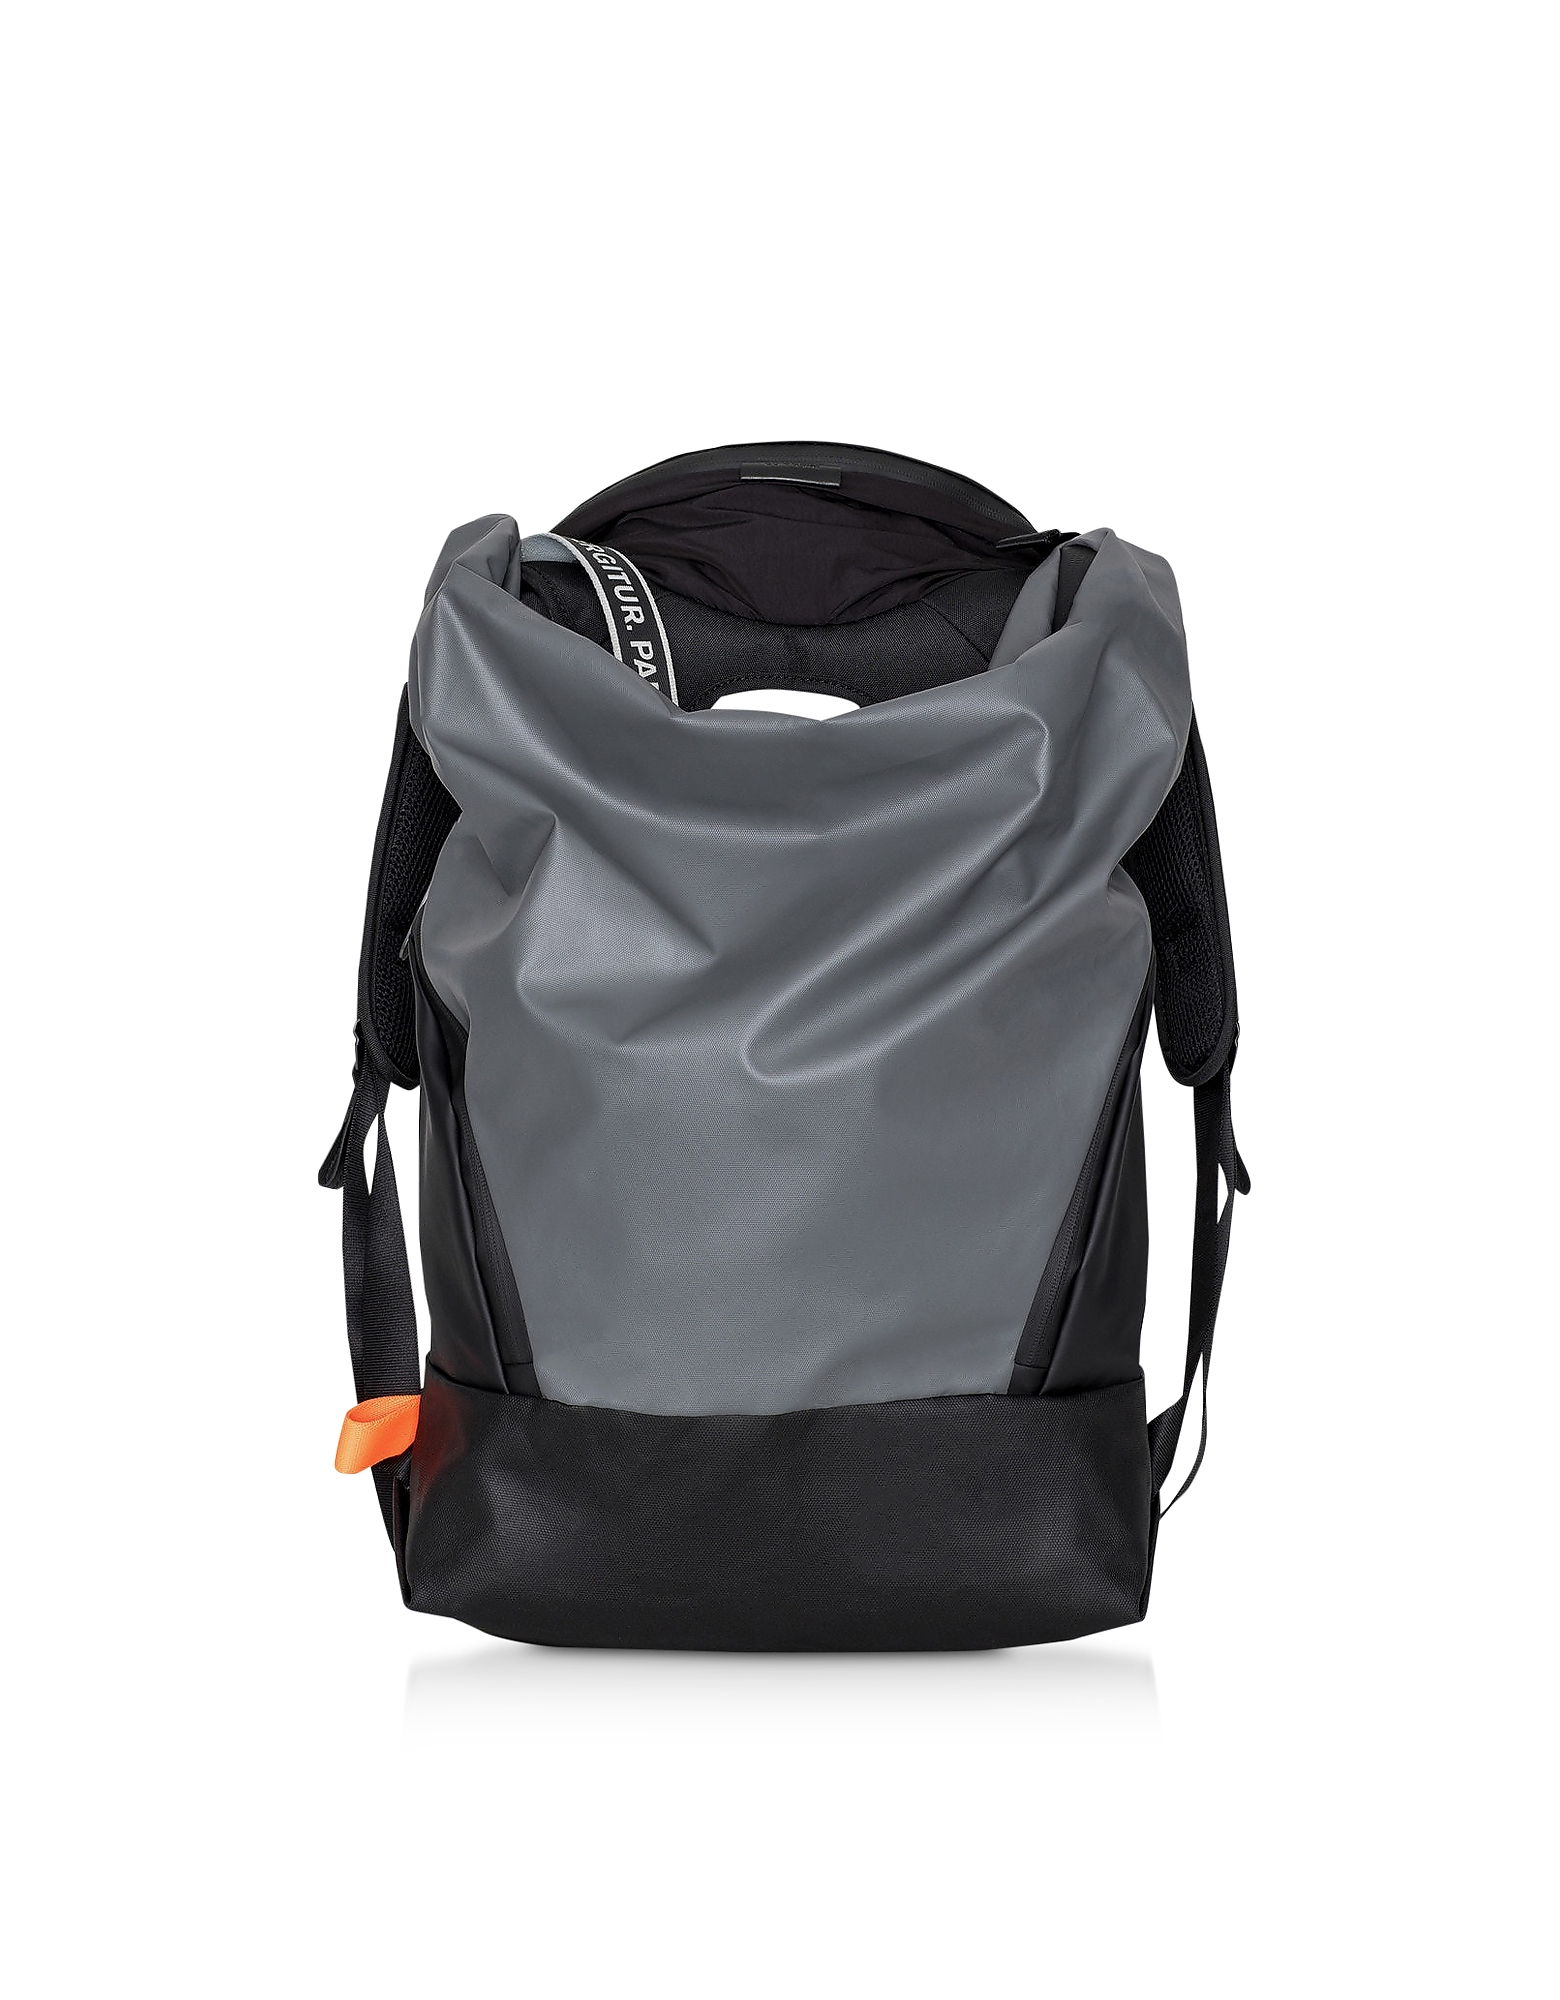 Clay Grey Timsah Backpack